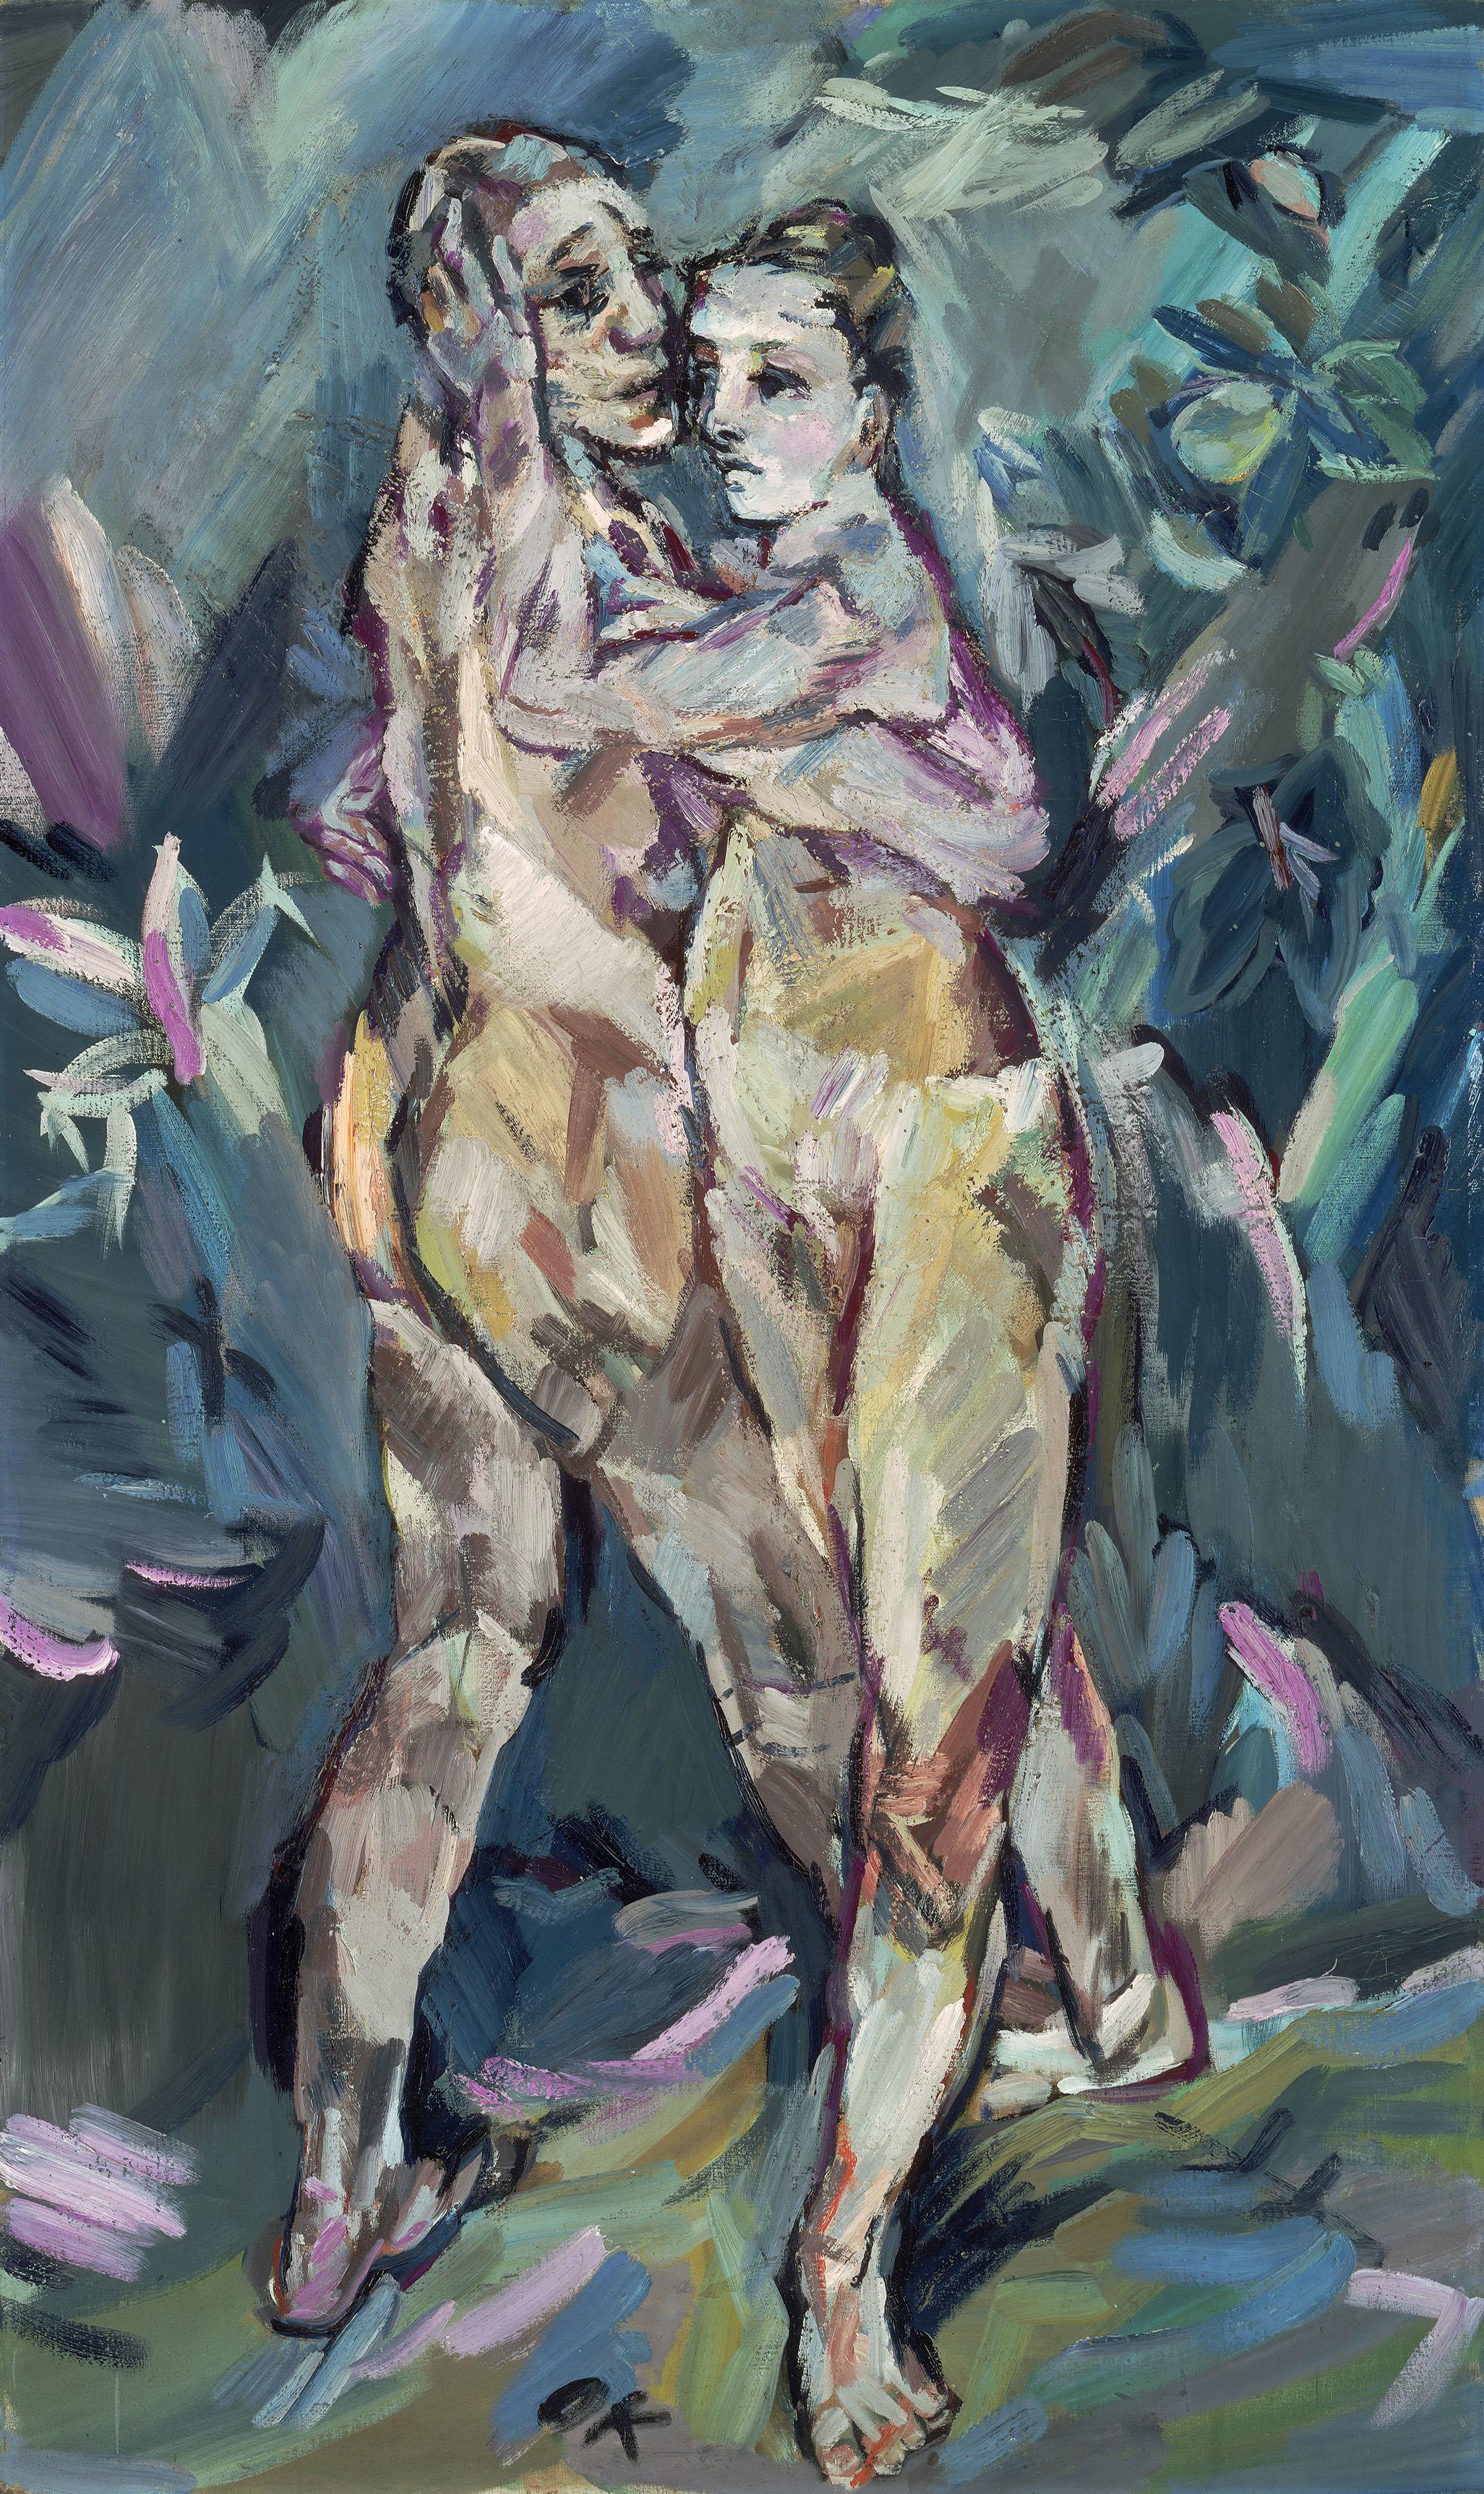 Two Nudes (Lovers) Oskar Kokoschka (Austrian, 1886–1980) 1913 Oil on canvas. Bequest of Sarah Reed Platt c. 2015 Fondation Oskar Kokoschka / Artists Rights Society (ARS), New York / ProLitteris, Zürich